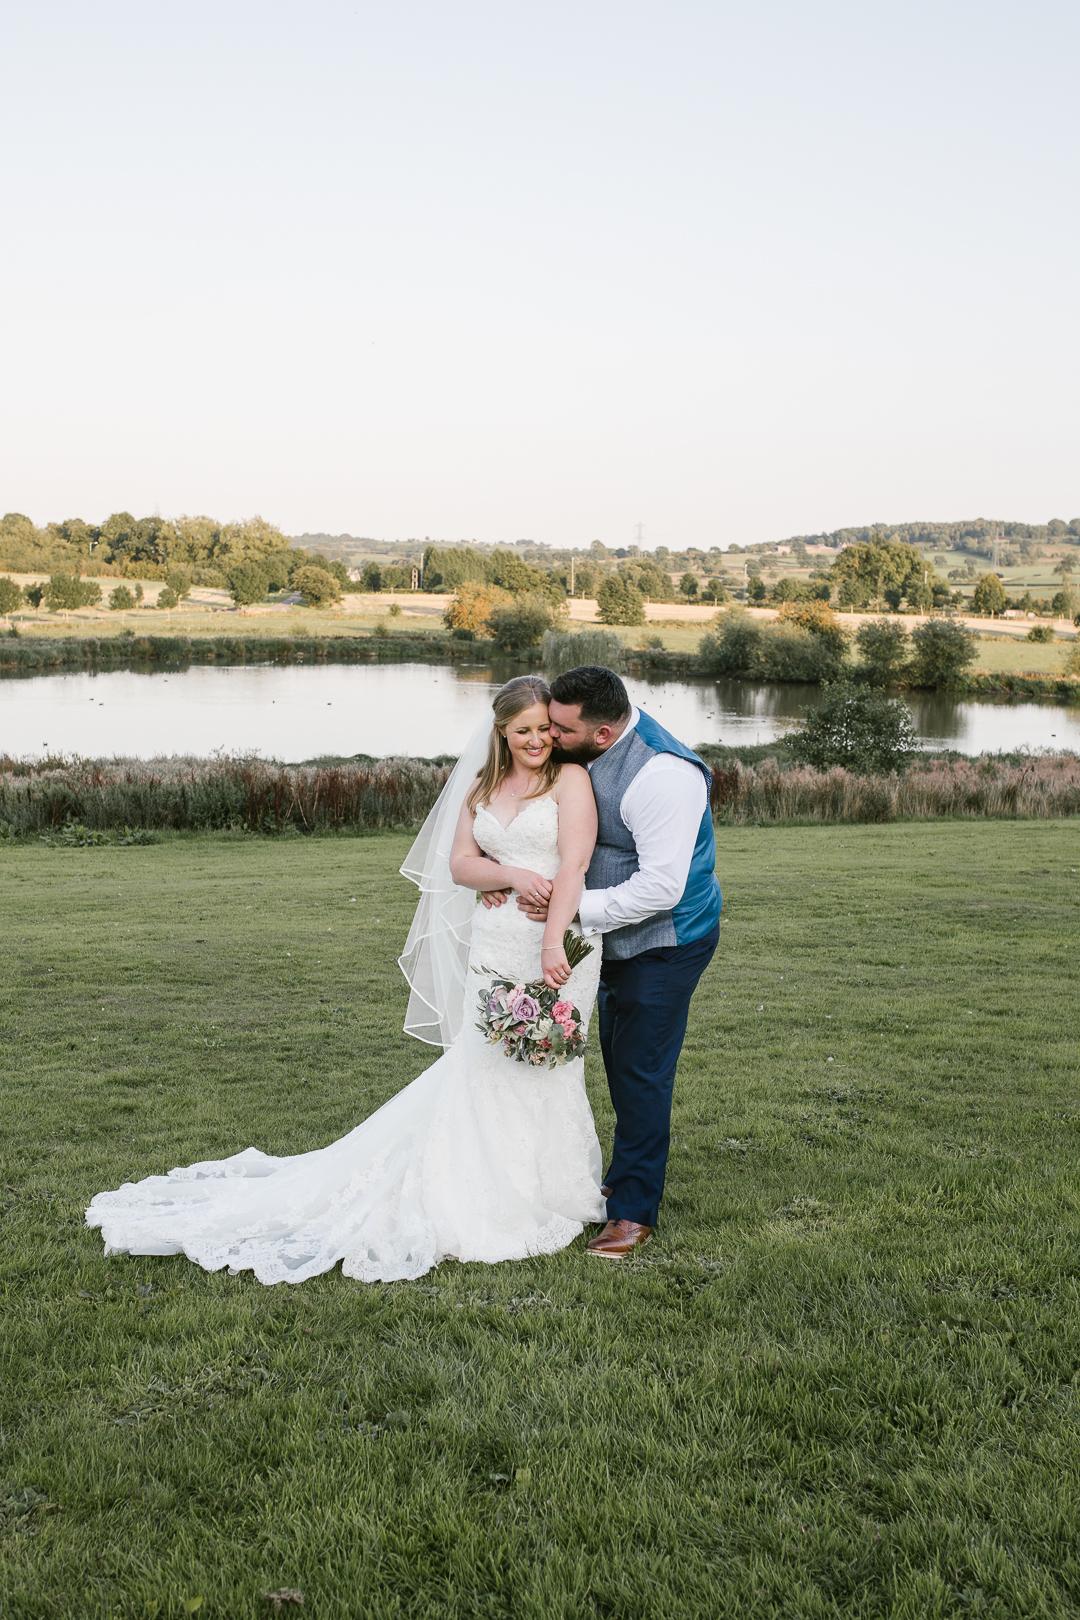 Ashes Barn, The Ashes Barn Wedding photographer, Staffordshire wedding photographer, danielle victoria photography -138.jpg